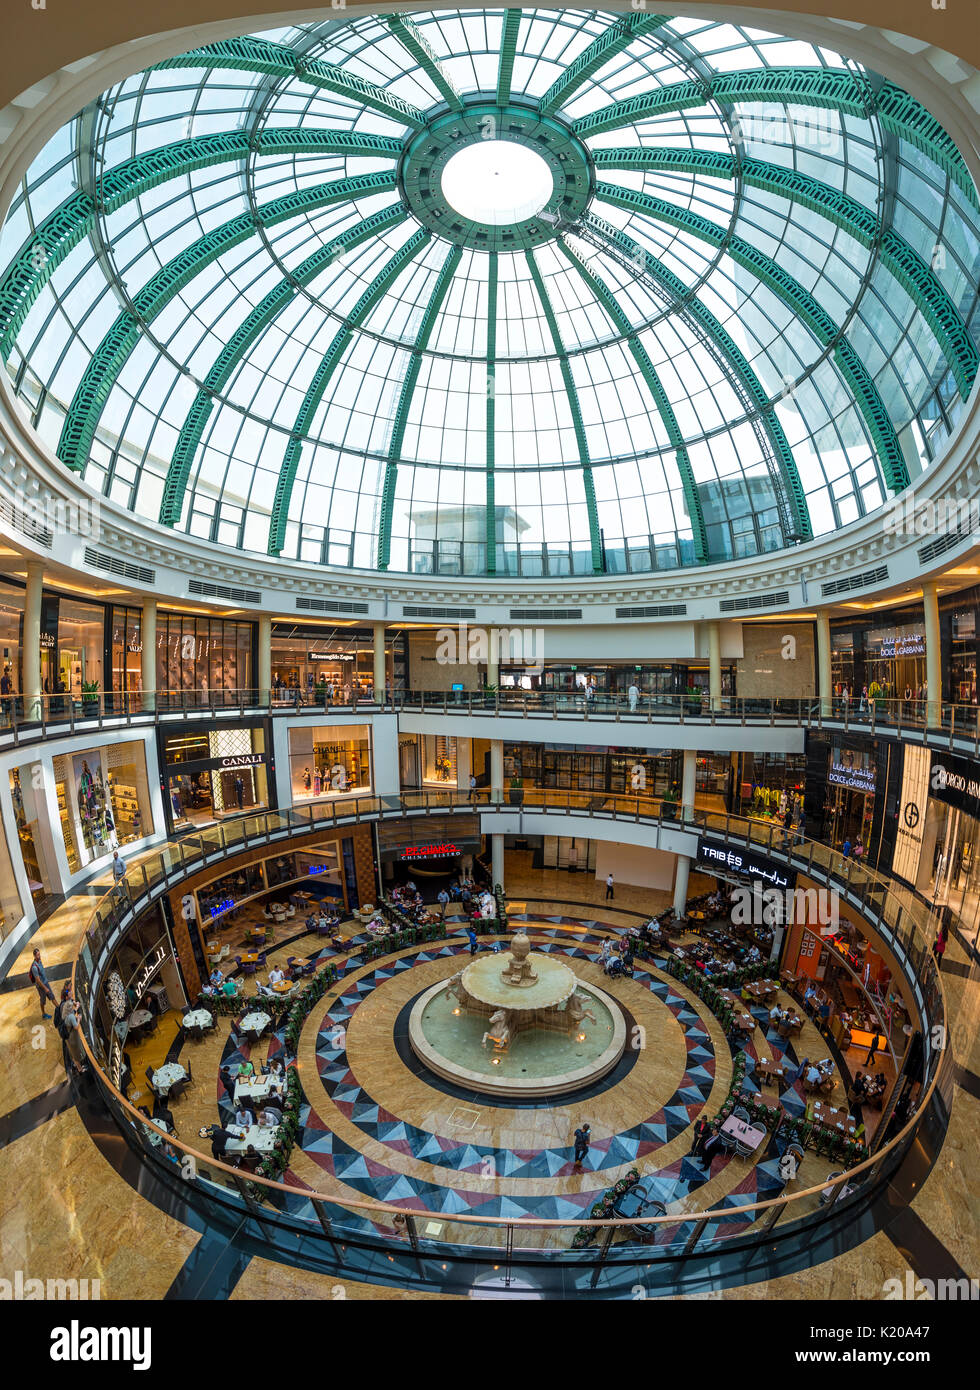 mall of emirates vans